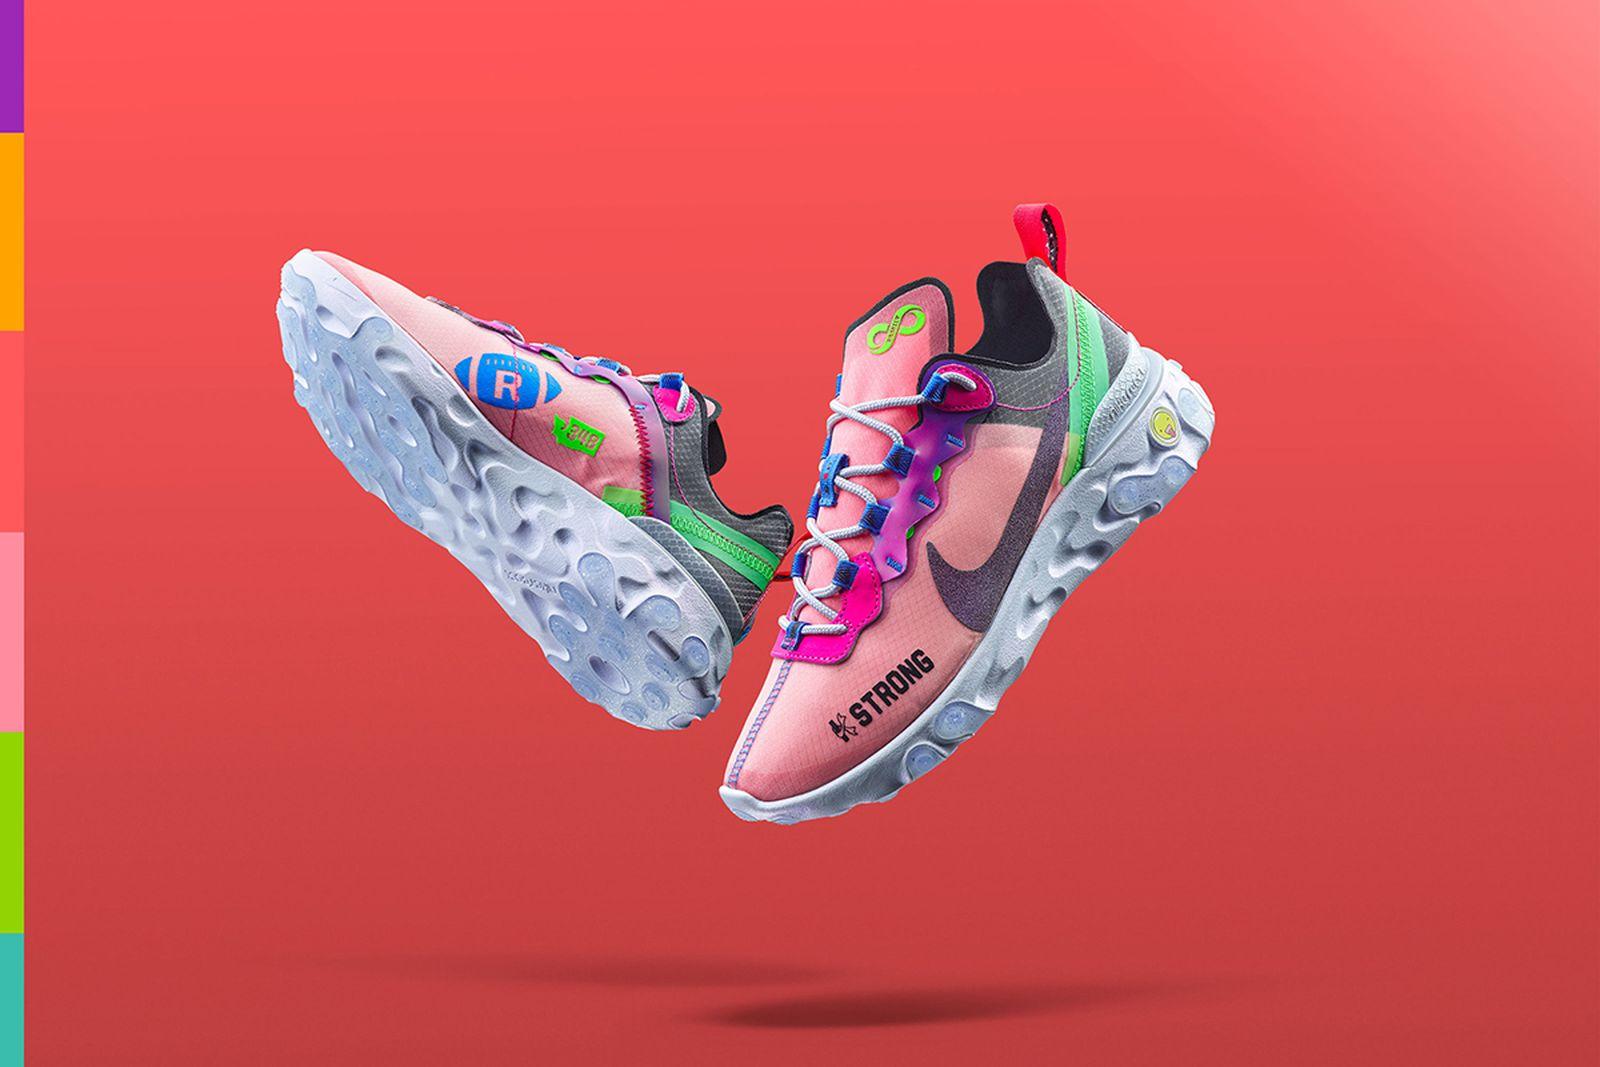 Nike Doernbecher Freestyle 2019 React Element 55